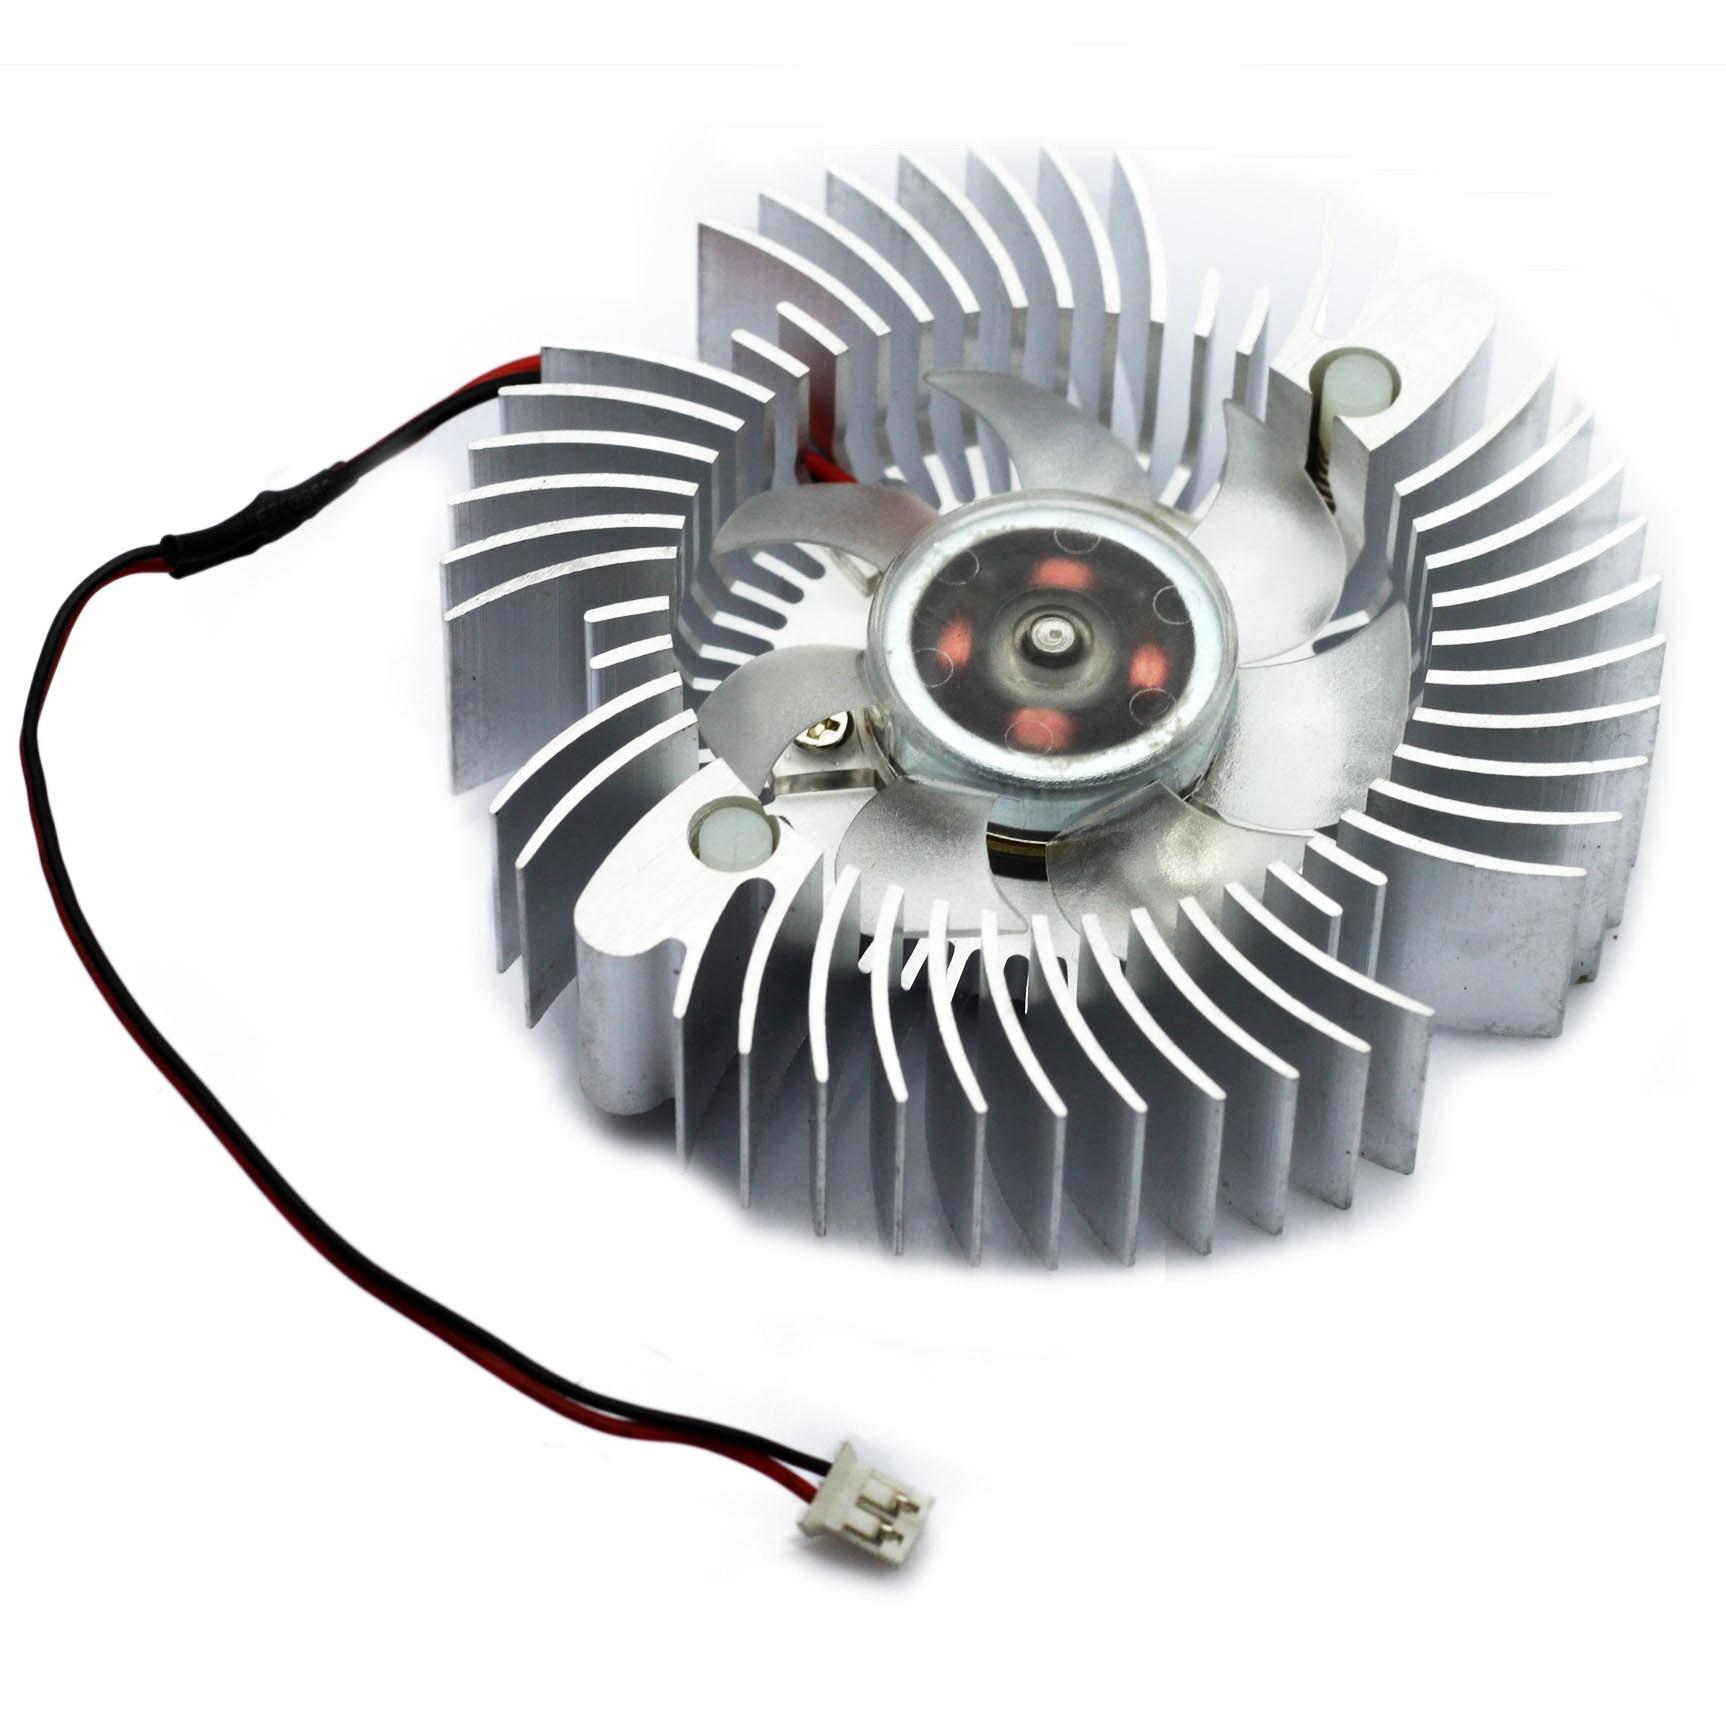 10pcs 40mm Aluminum 2pin Computer PC VGA Video Card Heatsink Cooler Cooling Fan